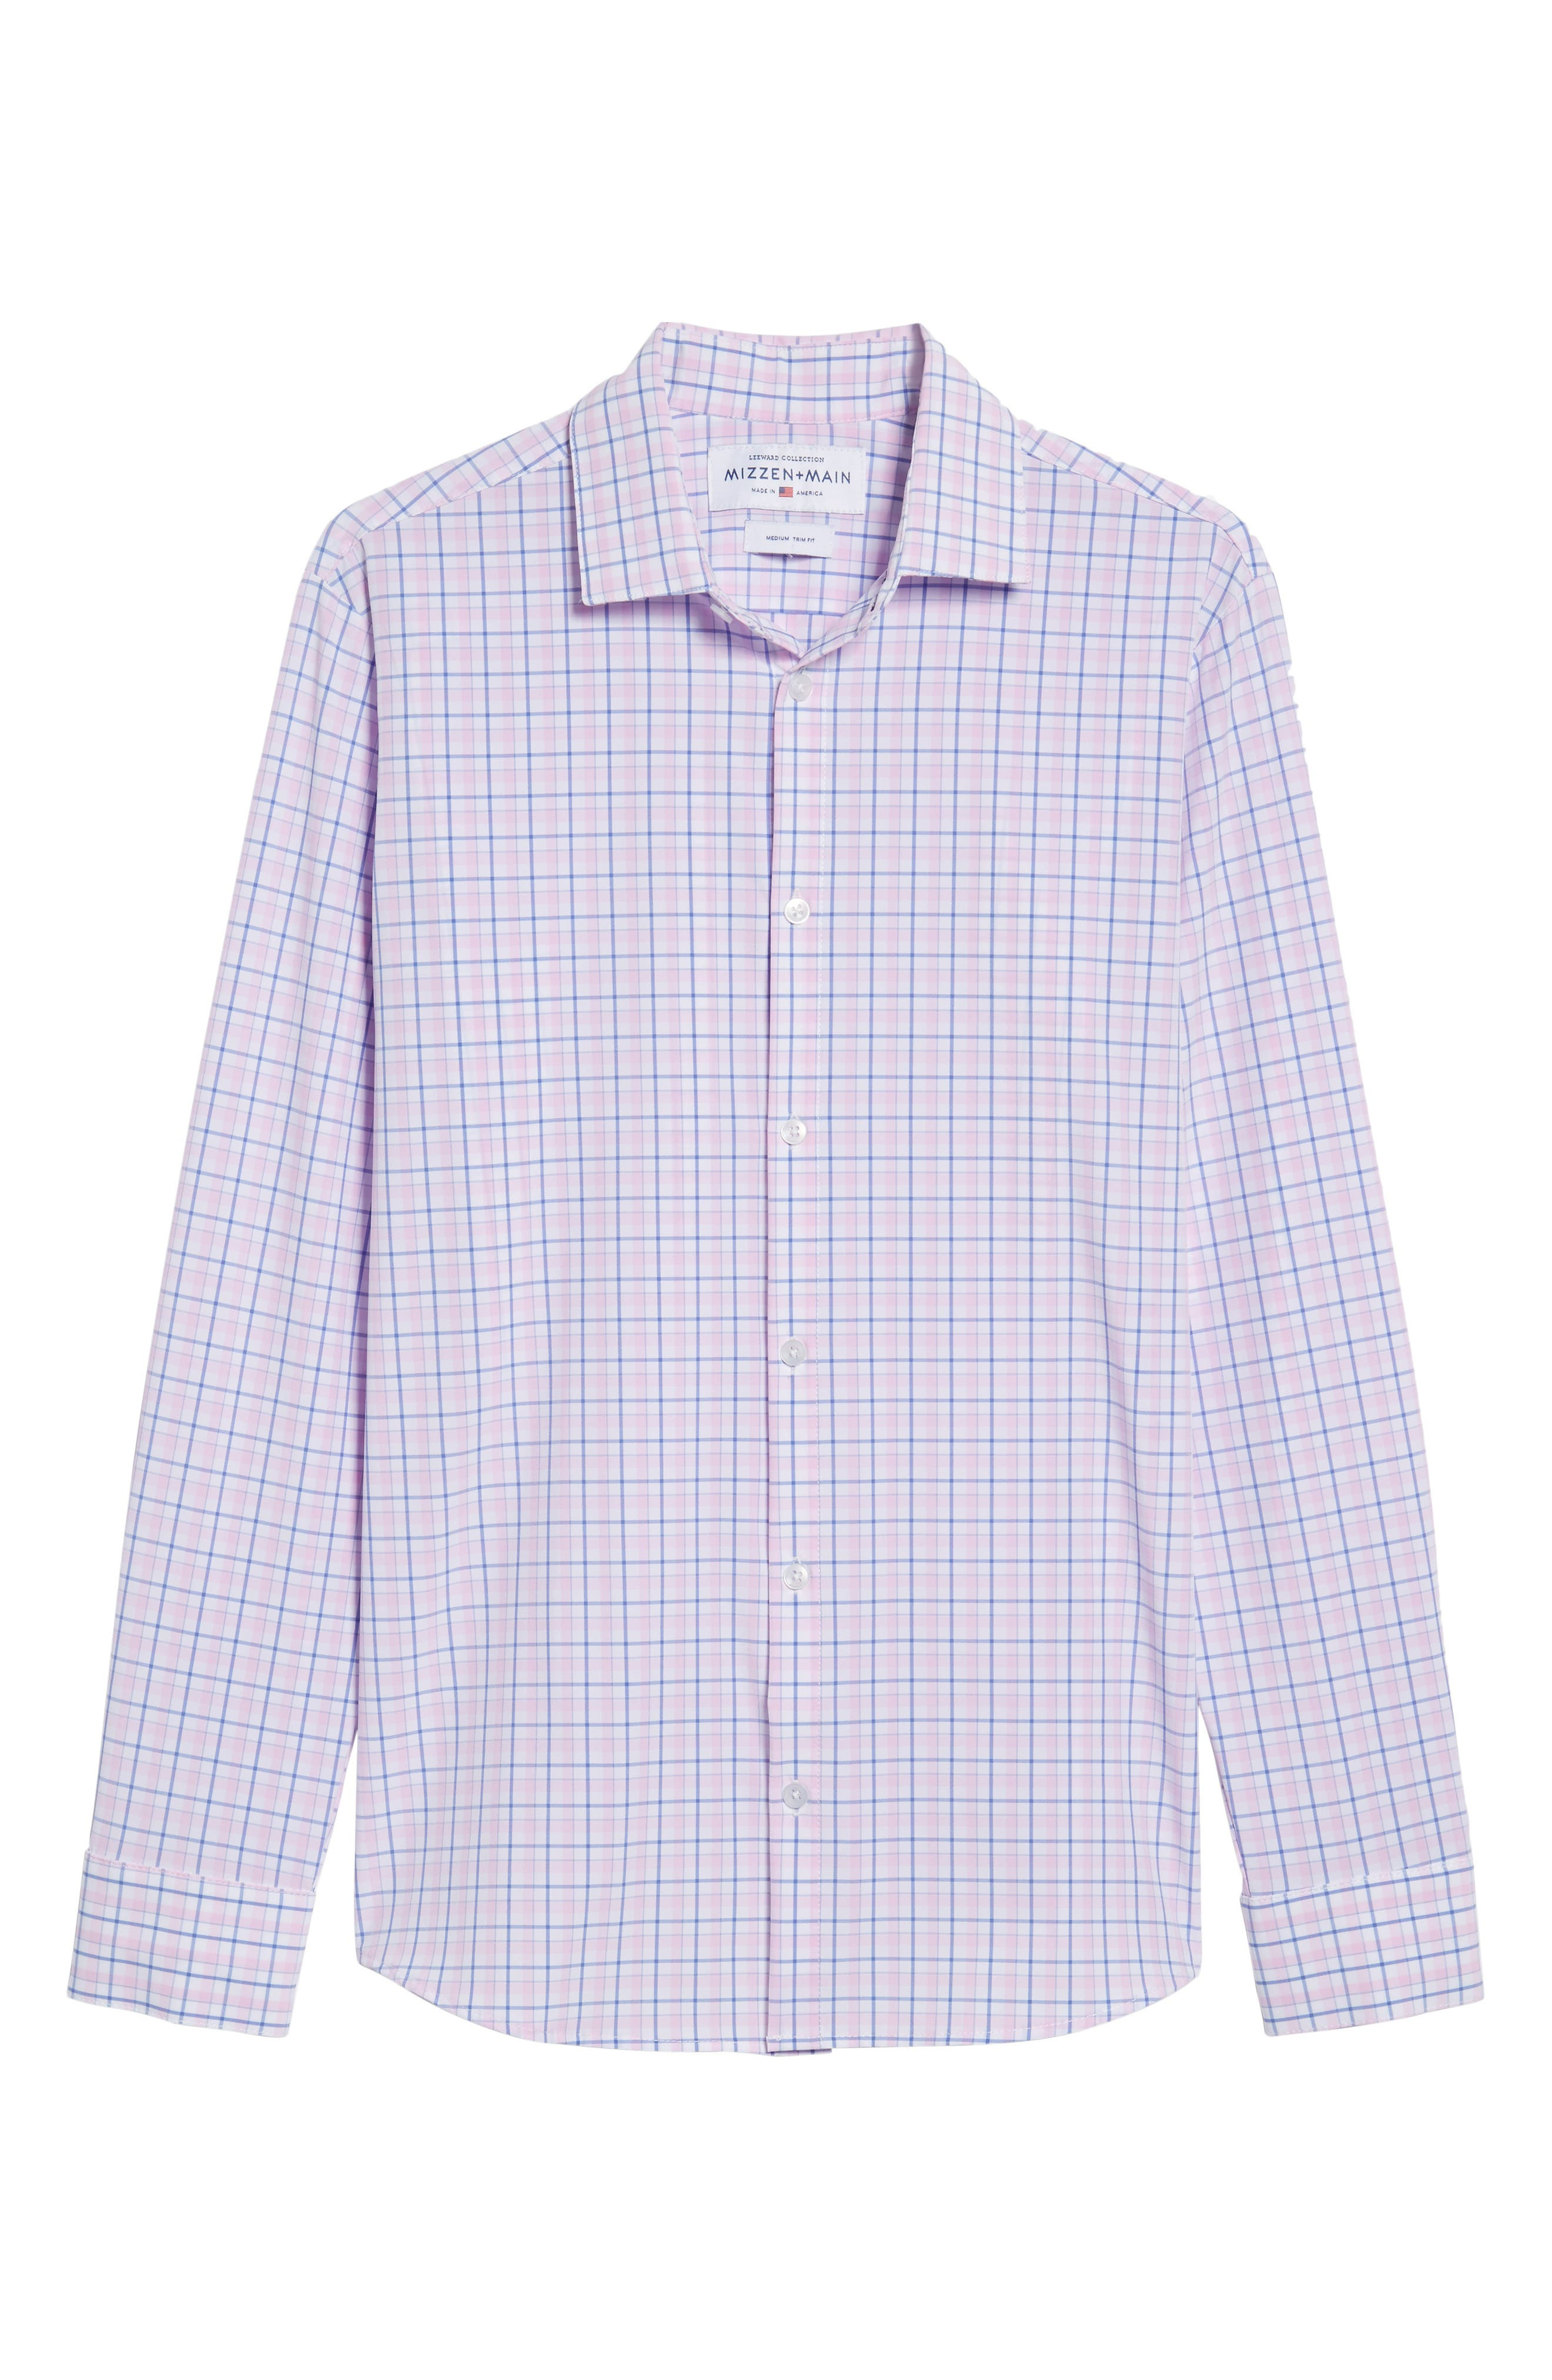 Wailea Plaid Sport Shirt,                             Alternate thumbnail 6, color,                             Pink